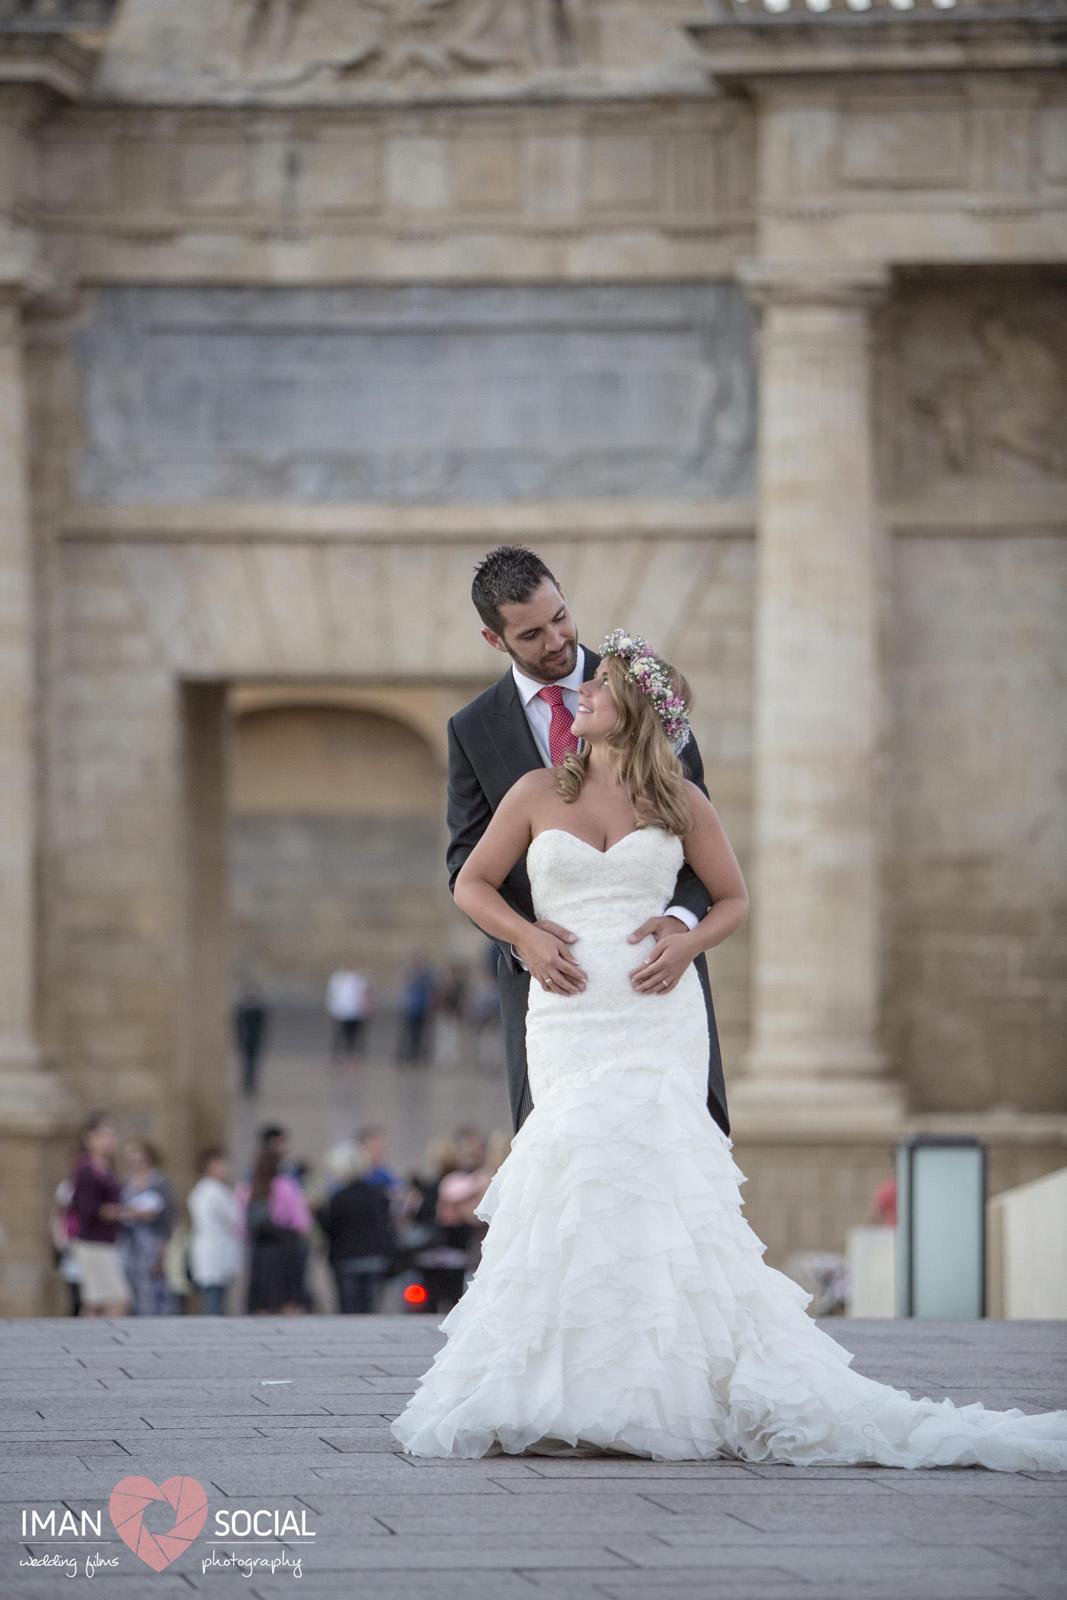 77B1051 Juan Antonio y Mónica - Postboda - video boda cordoba